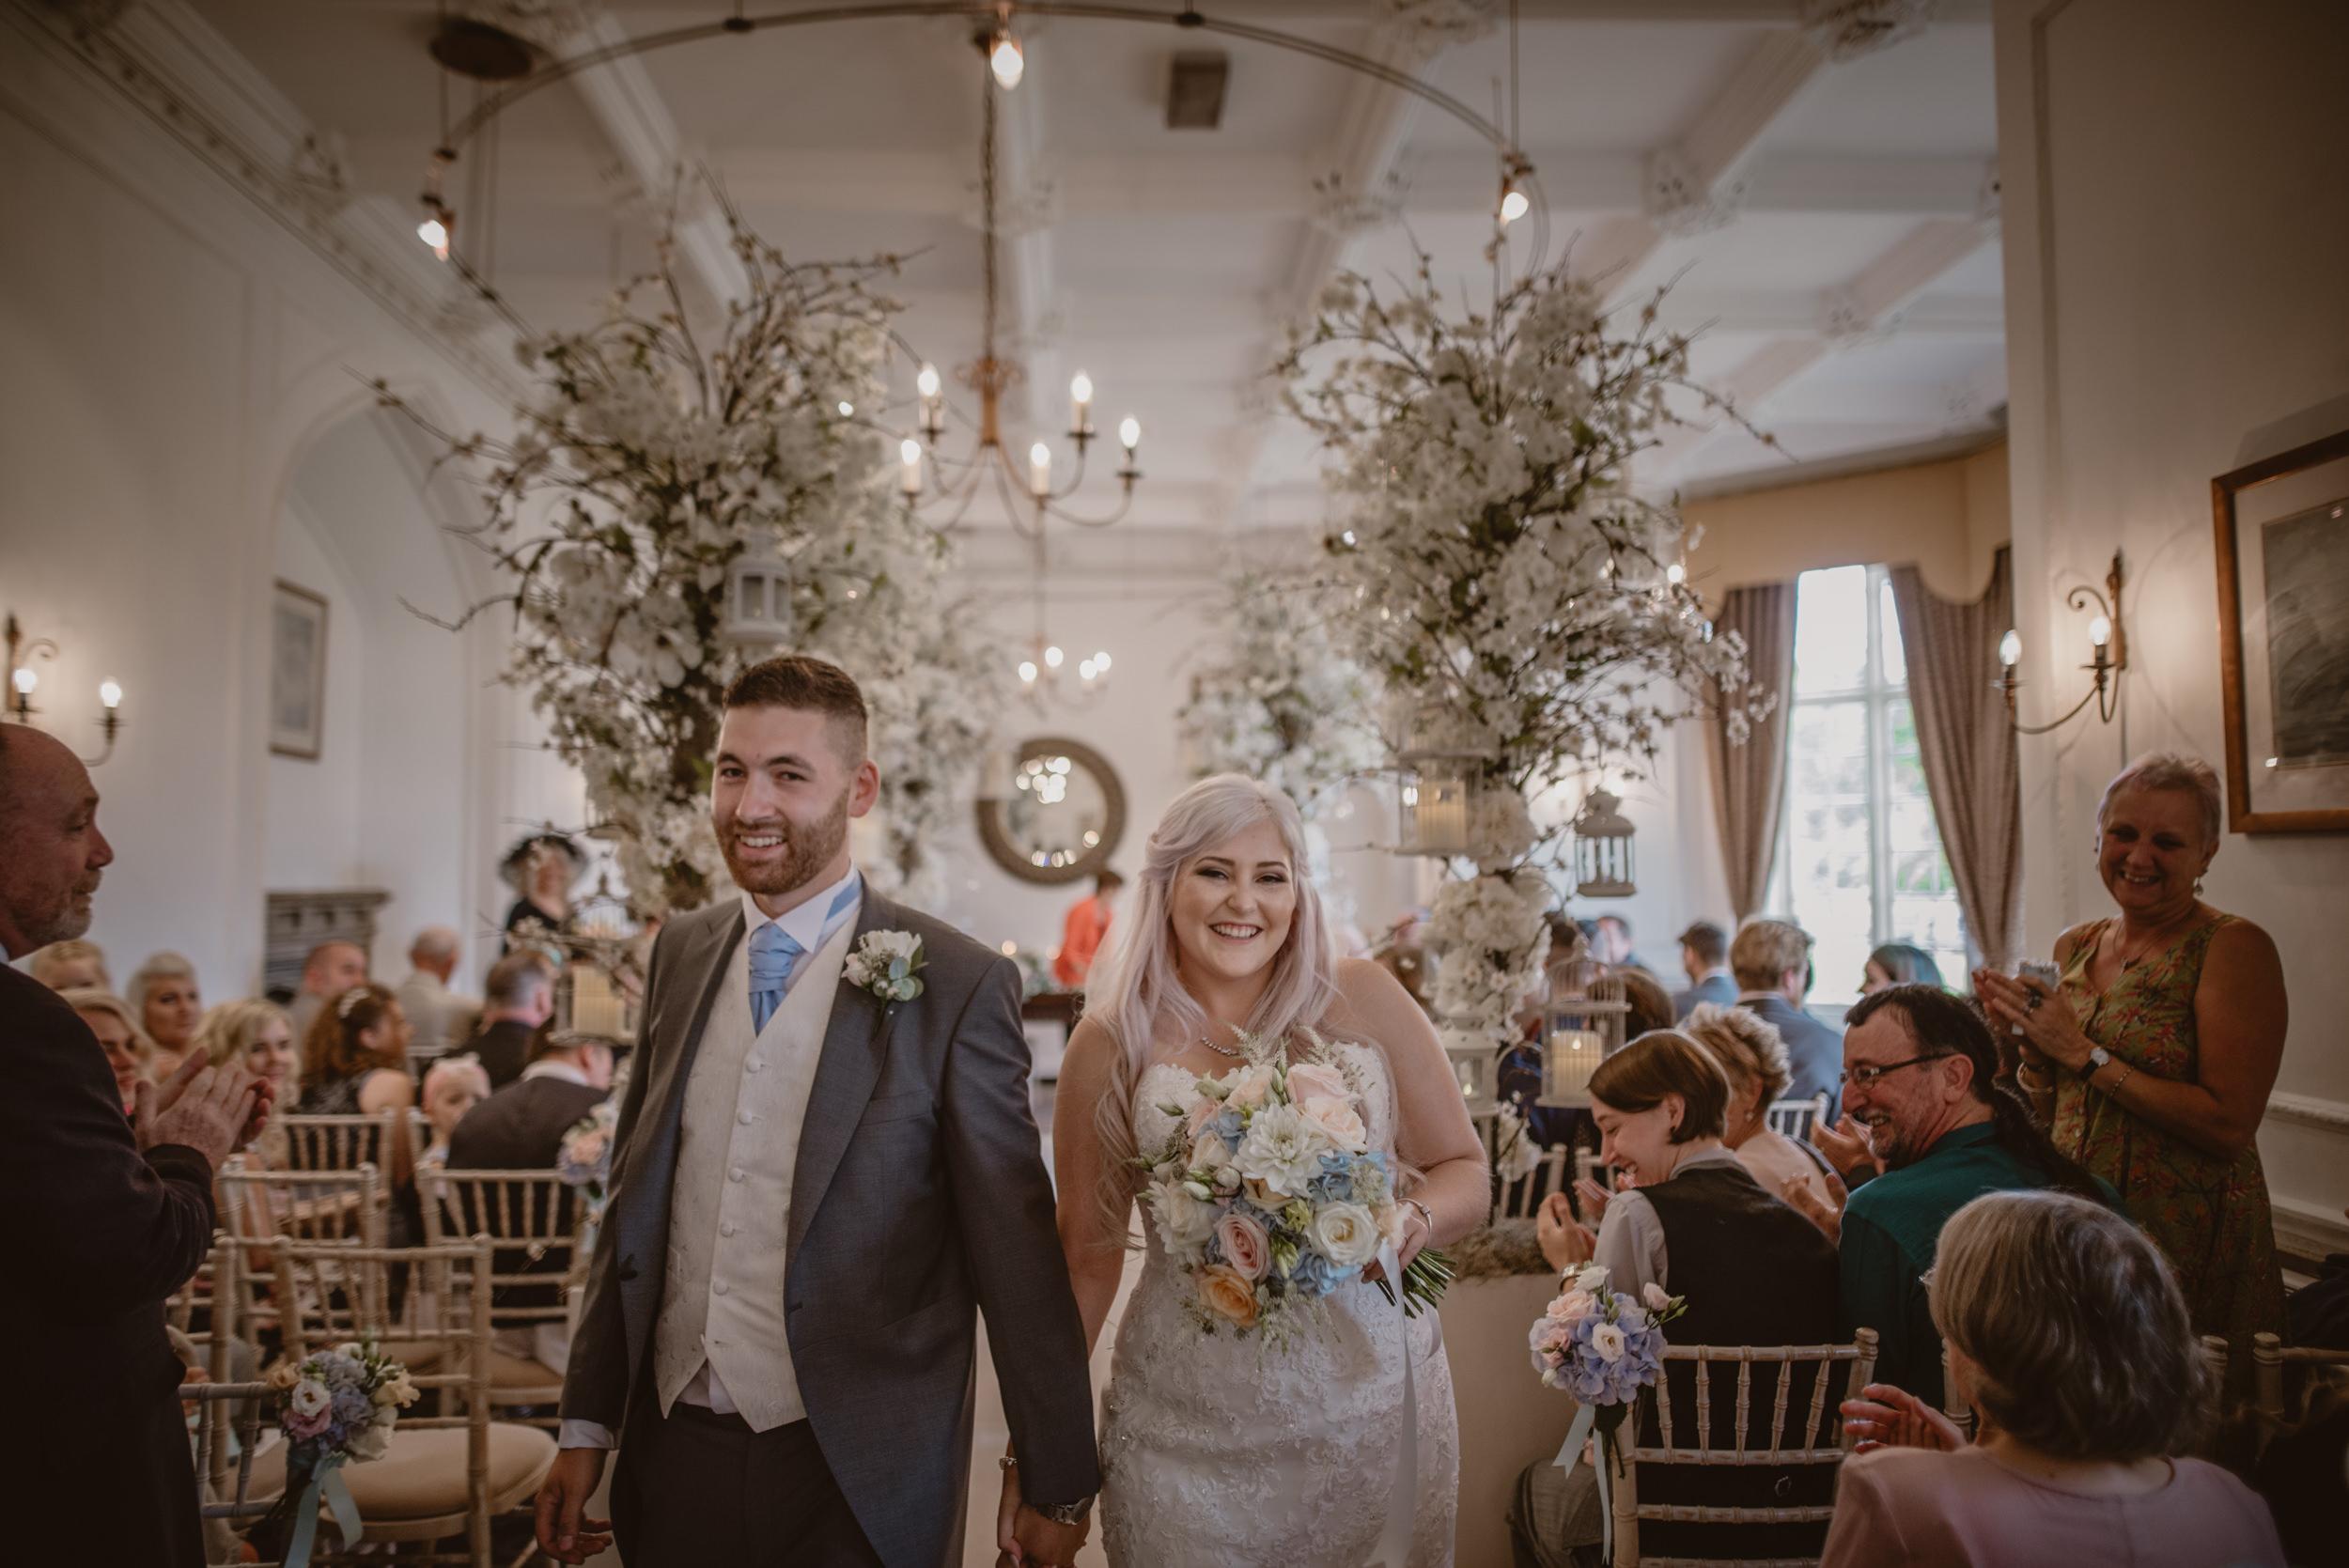 Rachel-and-James-Wedding-Horsley-Towers-State-Manu-Mendoza-Wedding-Photography-297.jpg